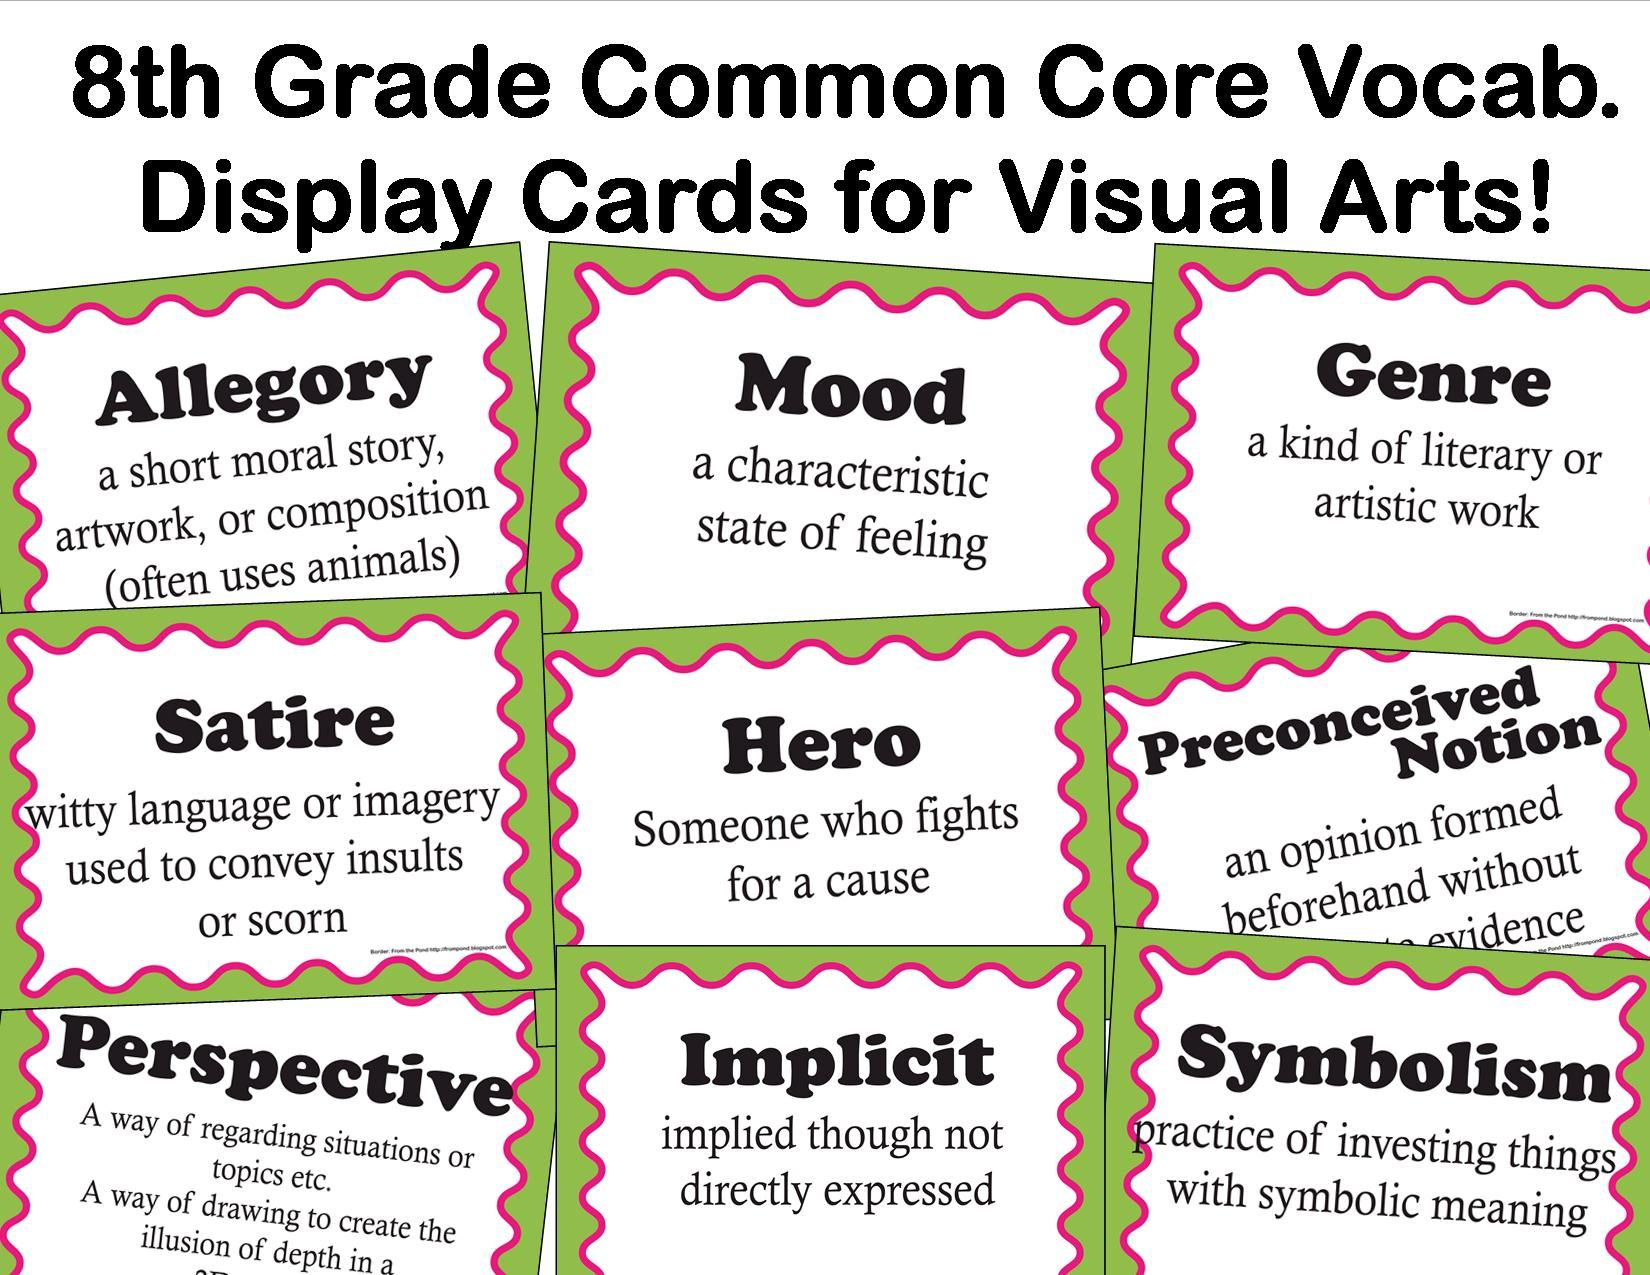 The Smartteacher Resource Common Core Language Arts Vocab For Visual Arts For 8th Grade